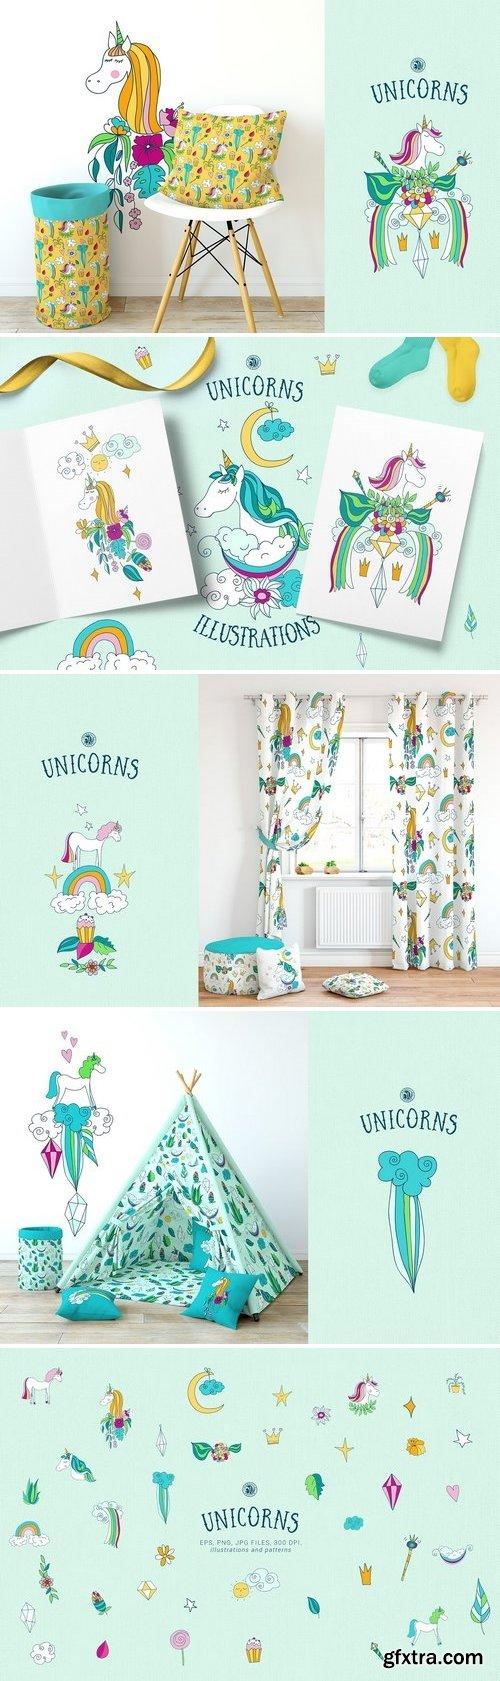 CM - Unicorns Illustrations 2611493